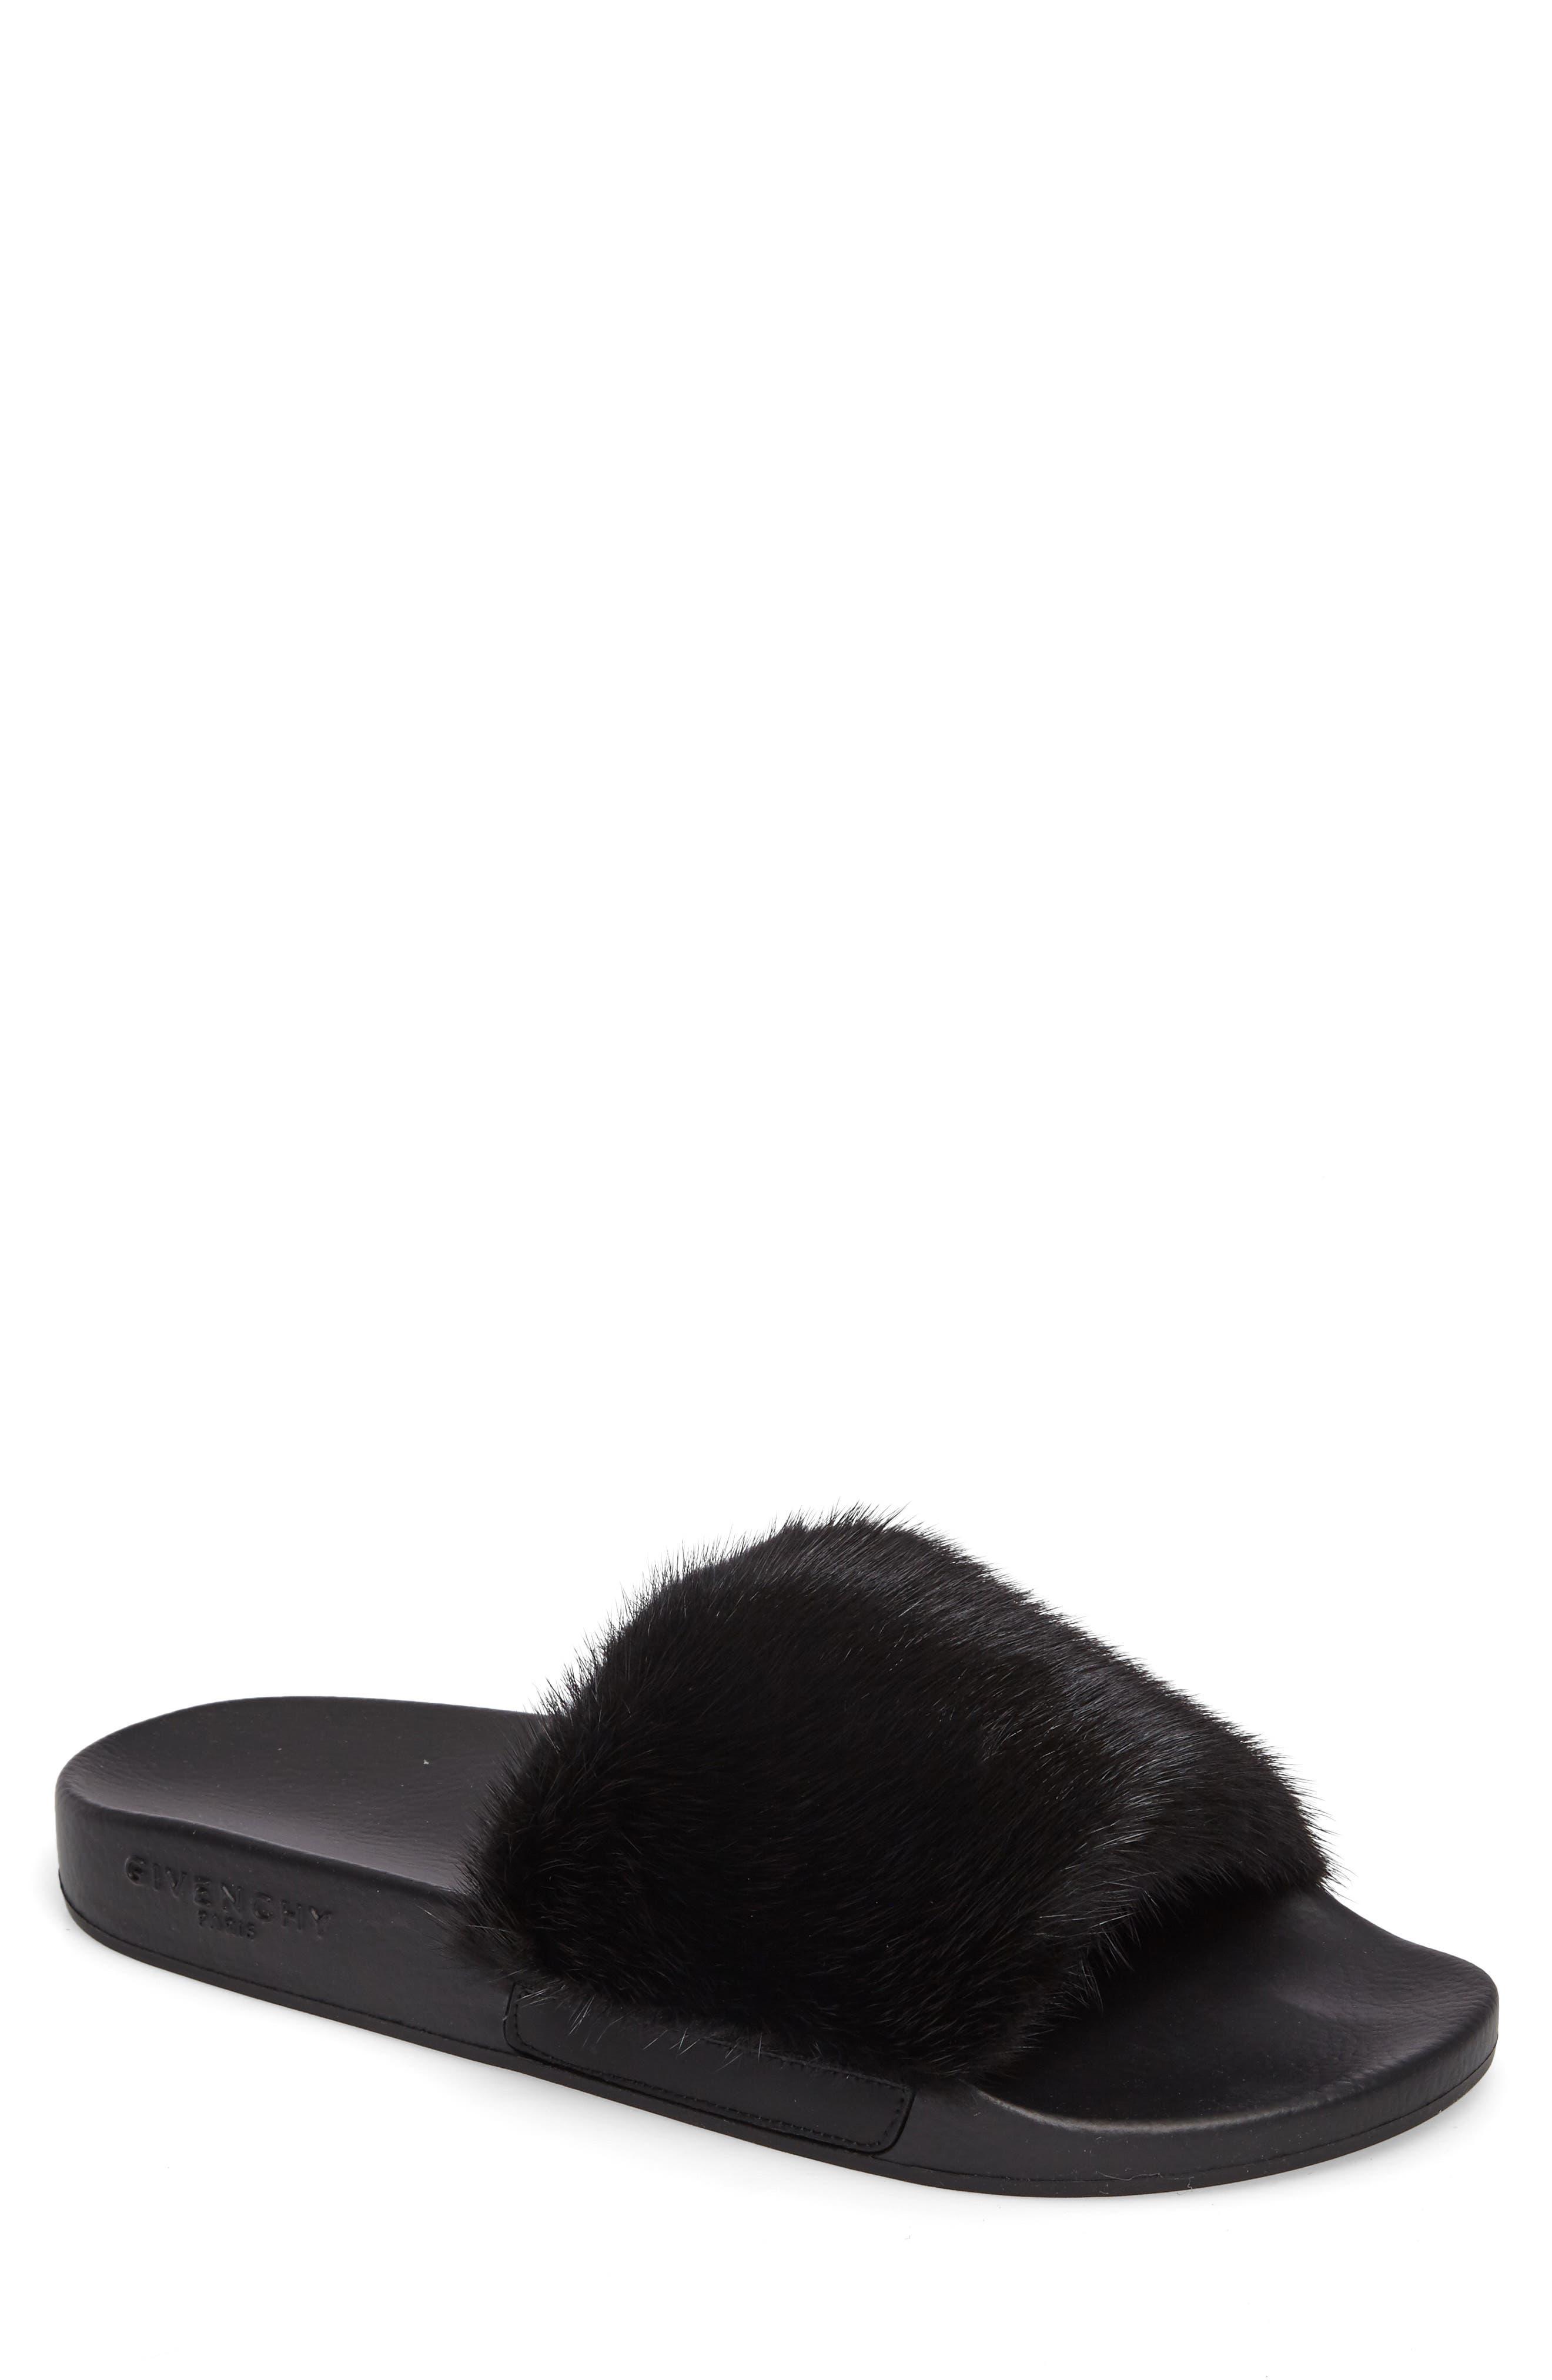 Genuine Mink Fur Slide Sandal,                             Main thumbnail 1, color,                             Black